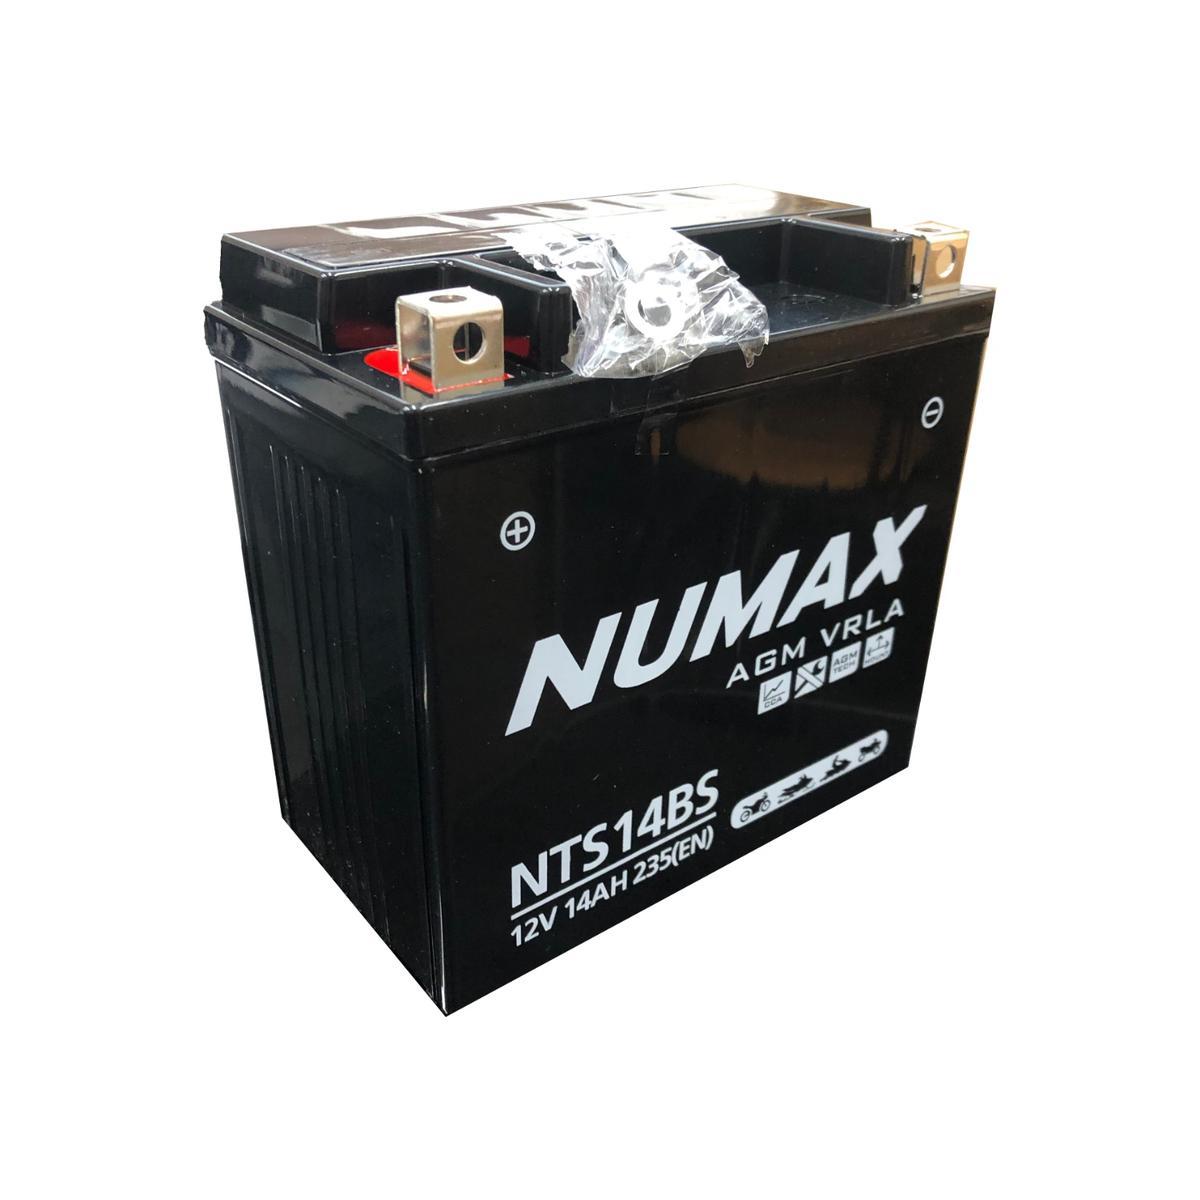 Numax NTS14BS 12v Motorbike Bike Battery TRIUMPH 1000 1200cc Trophy YTX14-4